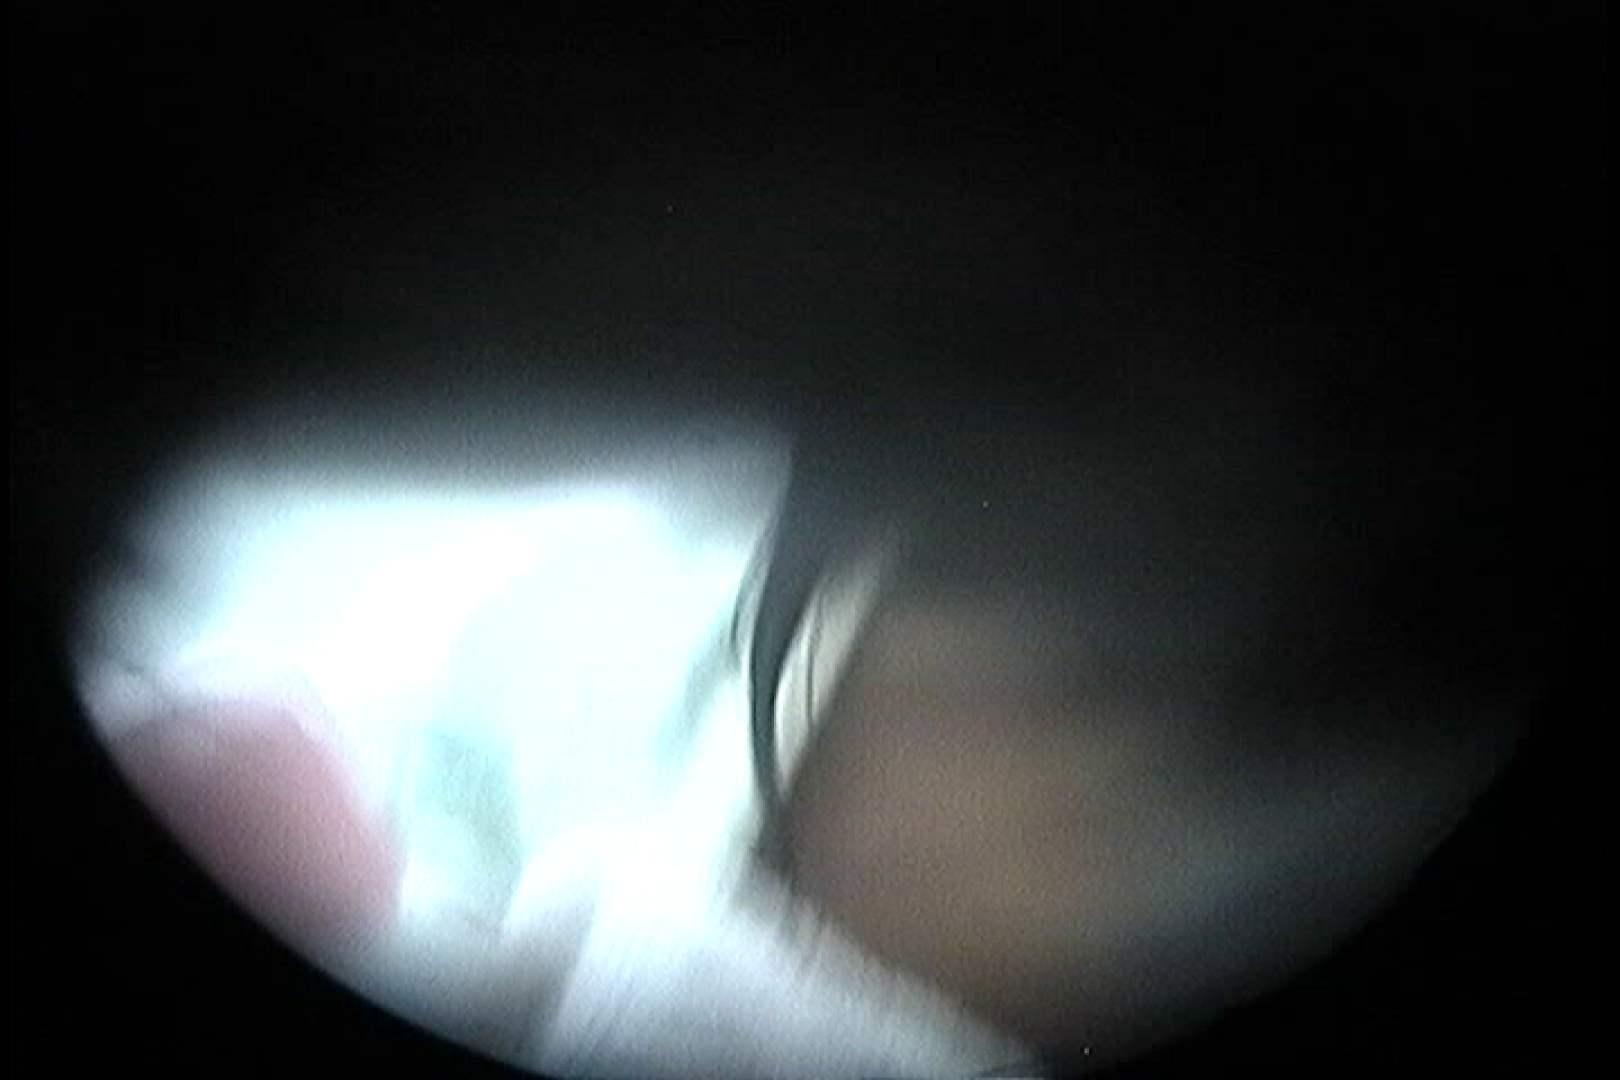 No.22 日焼け跡とオッパイの関係がおかしな貧乳ギャル 日焼け | ギャルエロ画像  89PICs 17